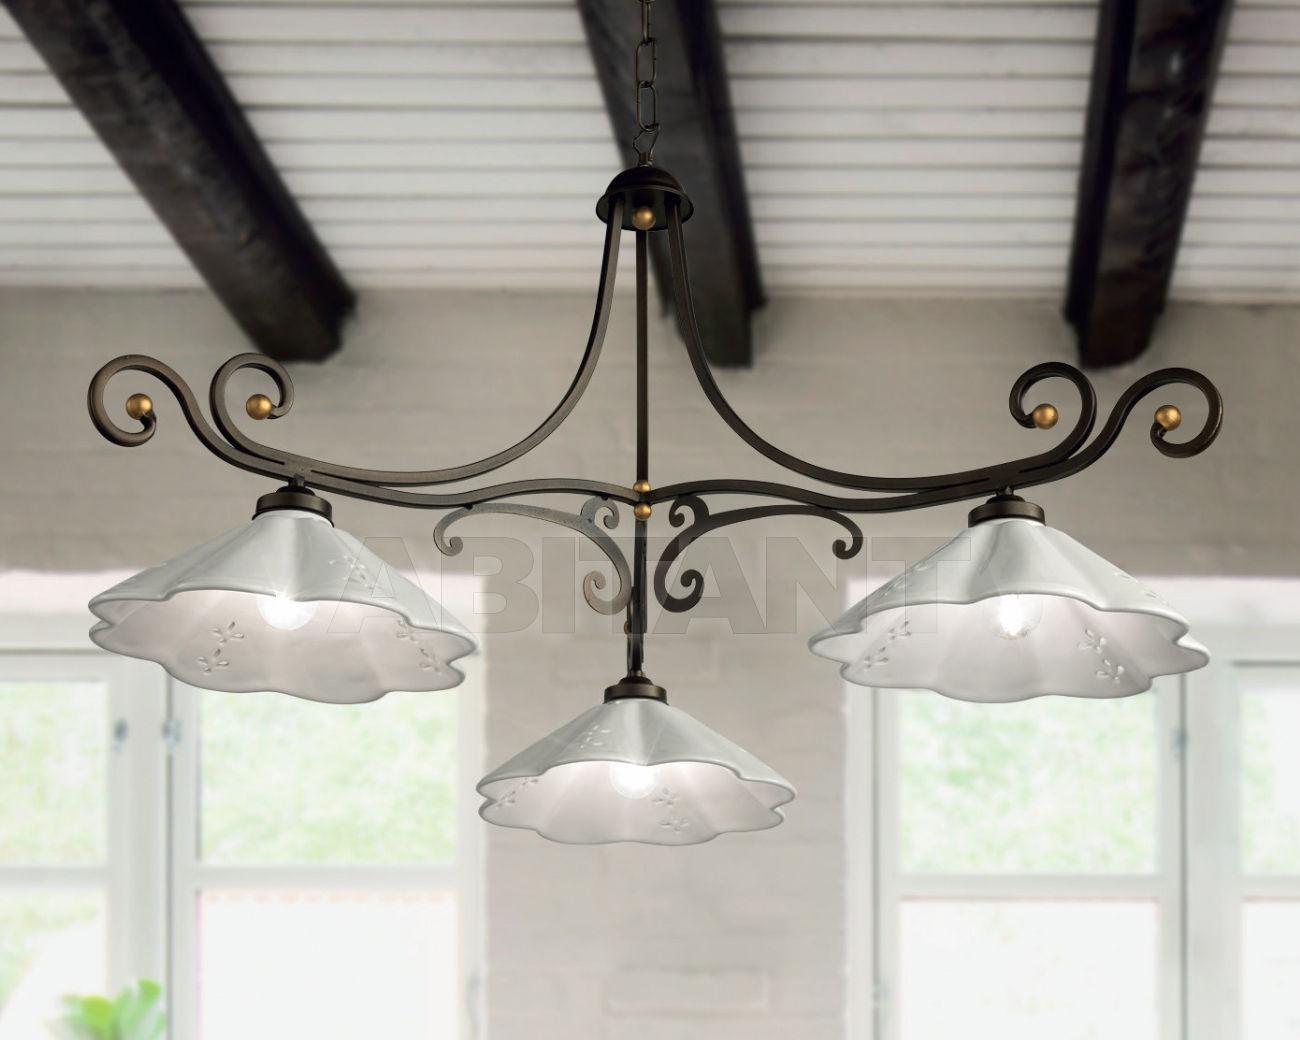 Купить Светильник Ciciriello Lampadari s.r.l. Lighting Collection SO.2019/3-RUG